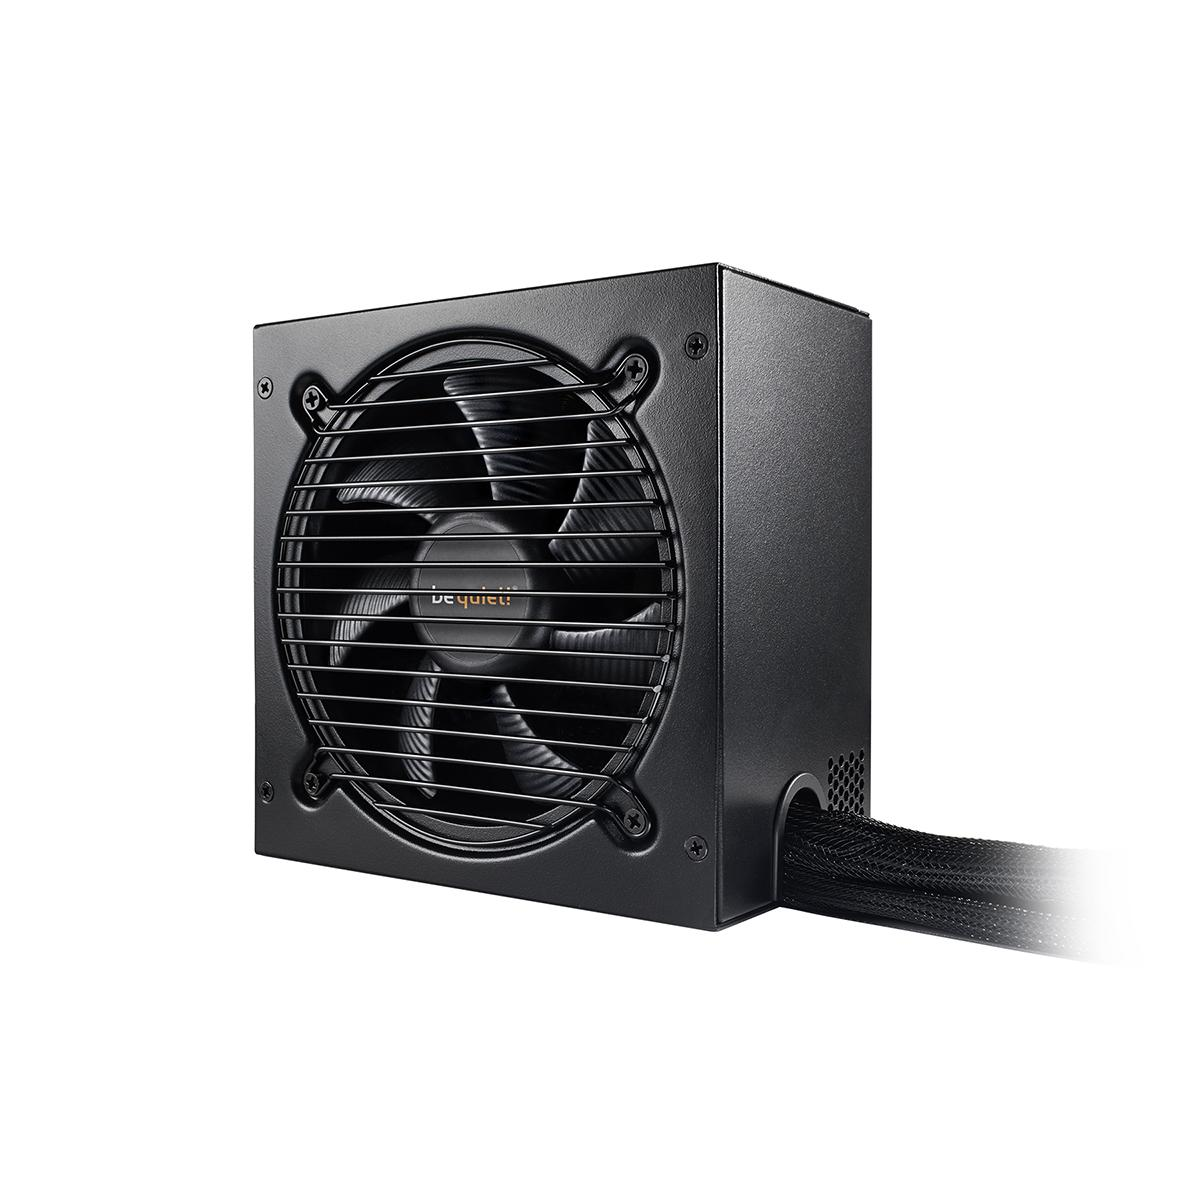 be quiet! Pure Power 11 300 W 80+ Bronze Certified ATX Power Supply